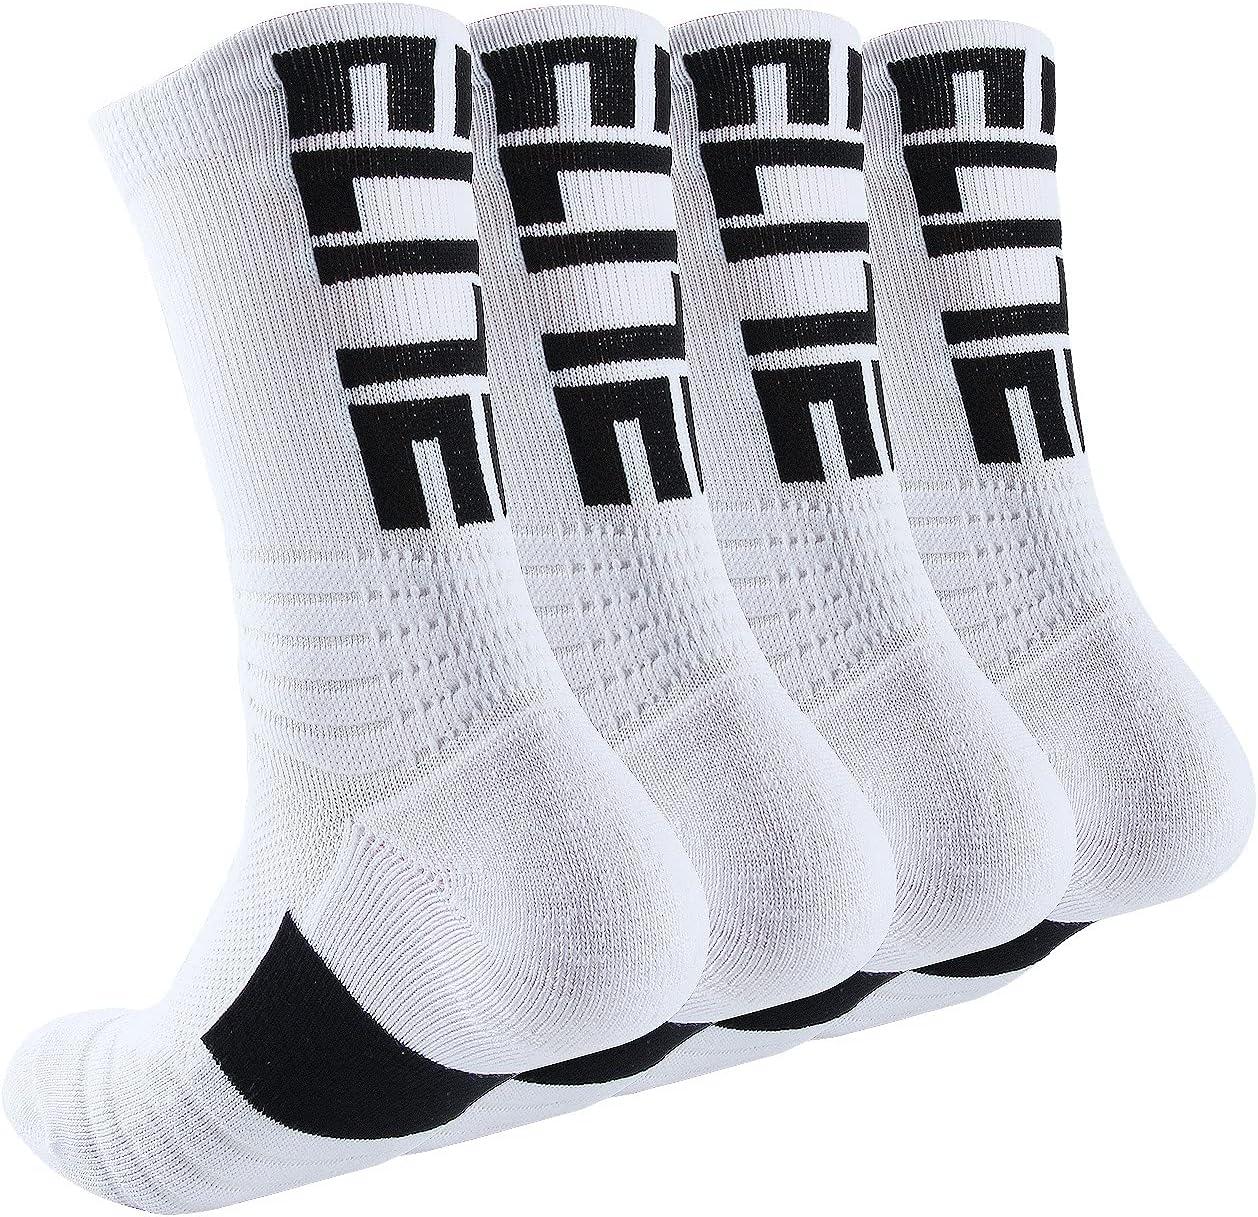 Popular brand in the world DILIBA Boys Basketball Socks Athletic Rare Cushion for Mid-Calf